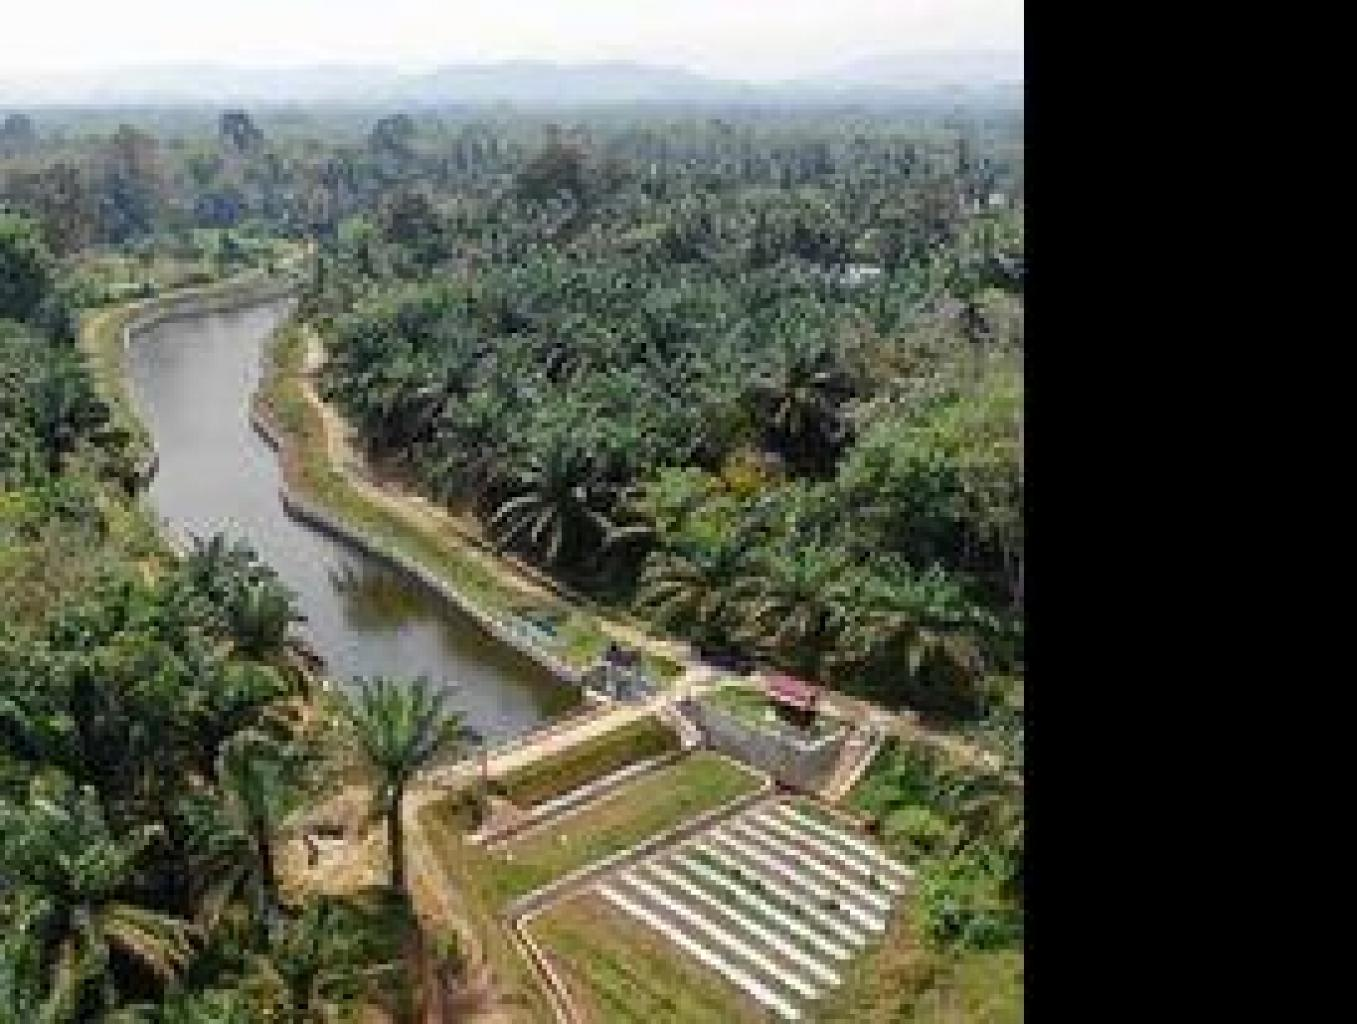 Desa Wisata Embung Gajah Meno